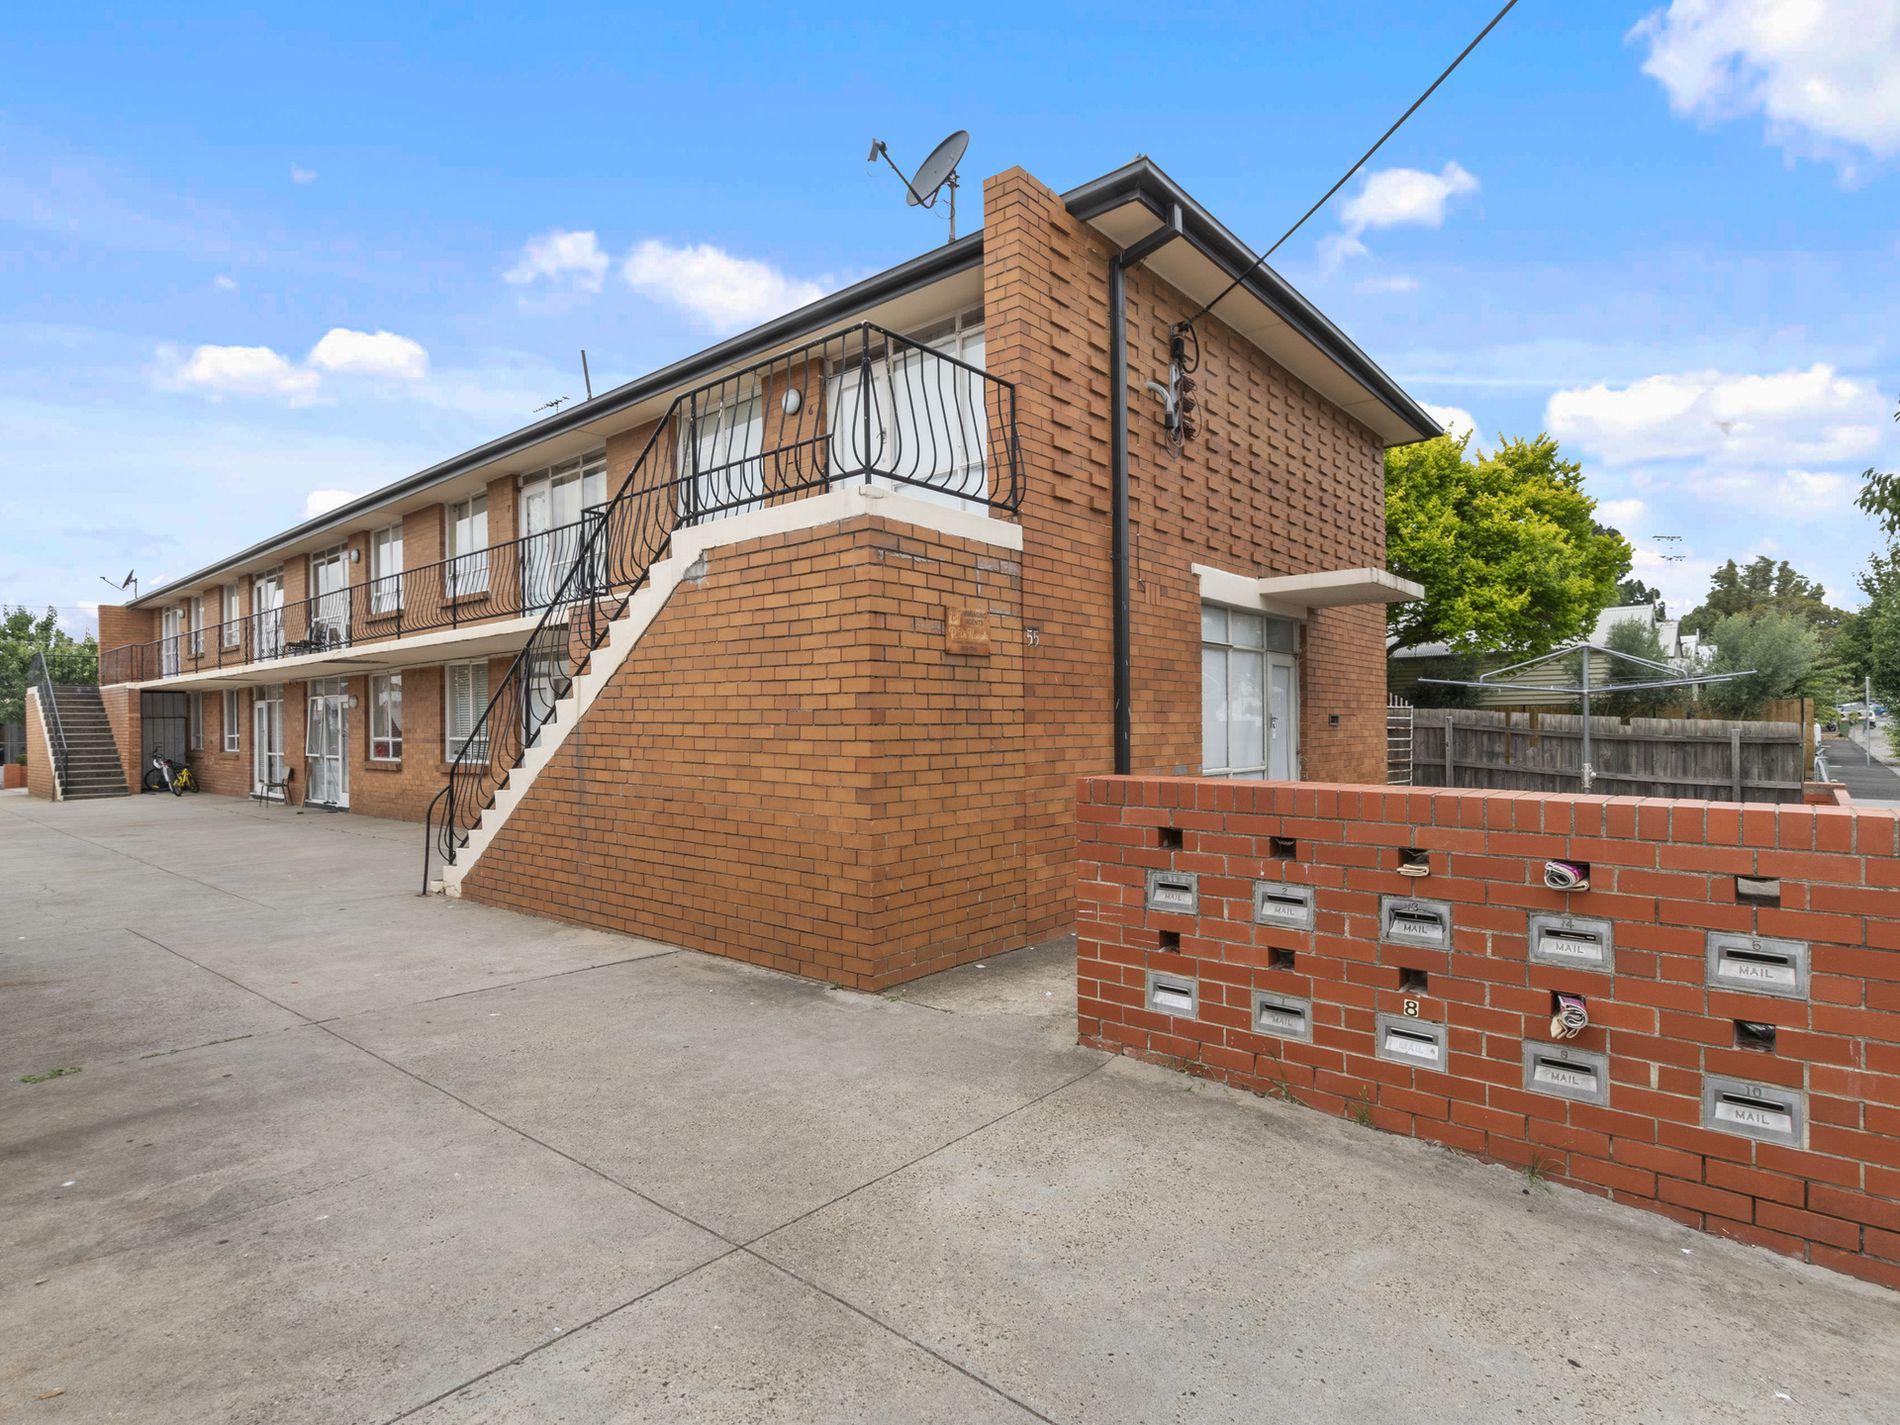 1-10 / 55 Swan Street, Footscray